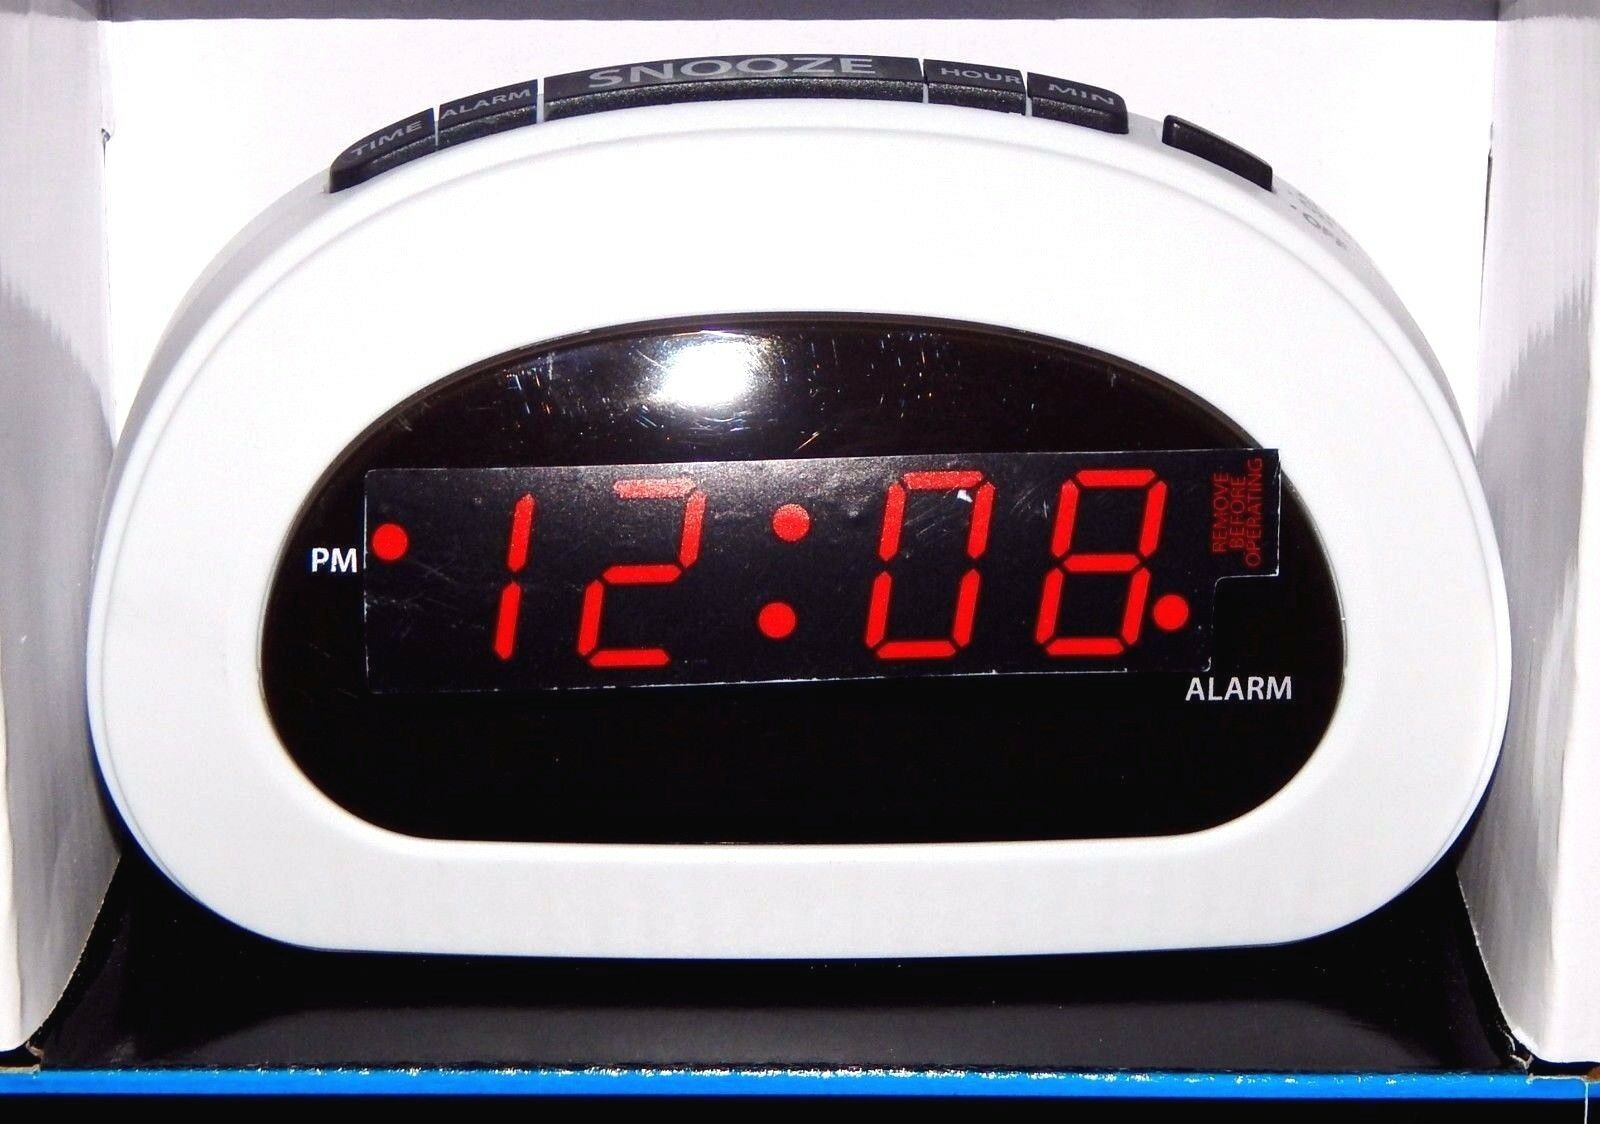 Mainstays Digital Alarm Clock Electric w/ Battery Backup, Snooze, Sleep White